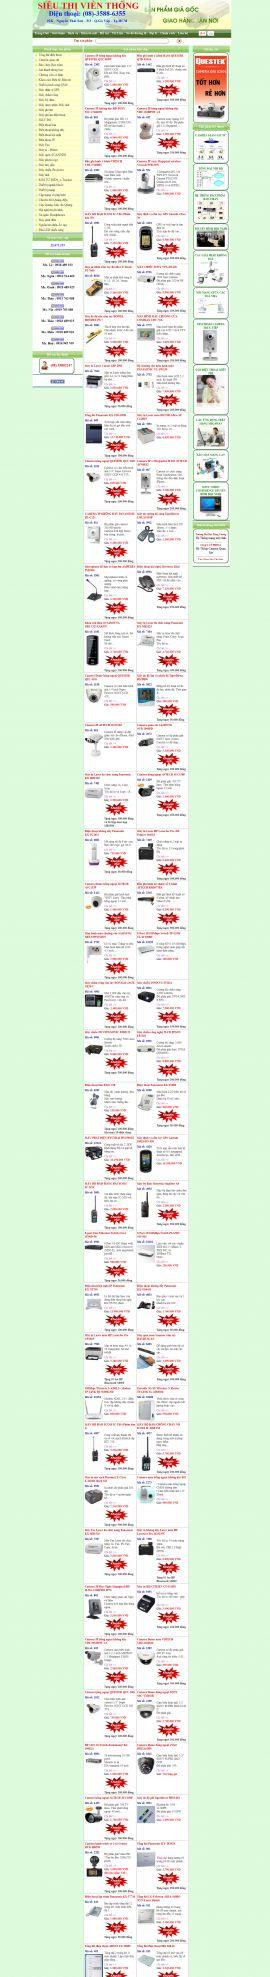 |Mẫu website siêu thị 10308